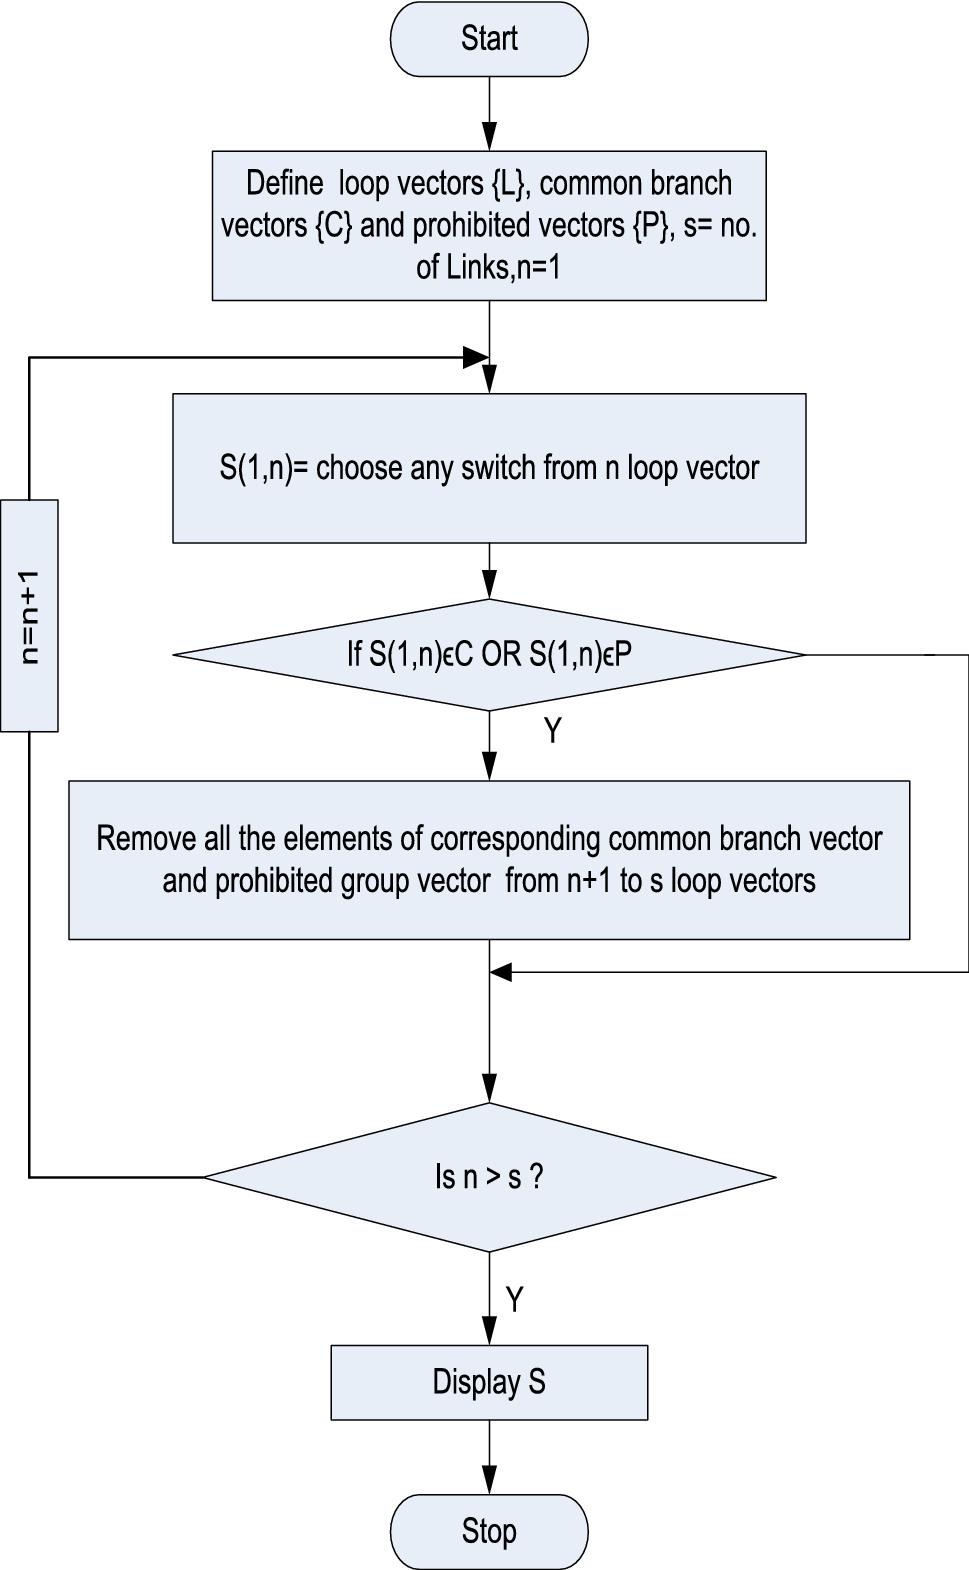 Optimal Reconfiguration of Distribution Network Using